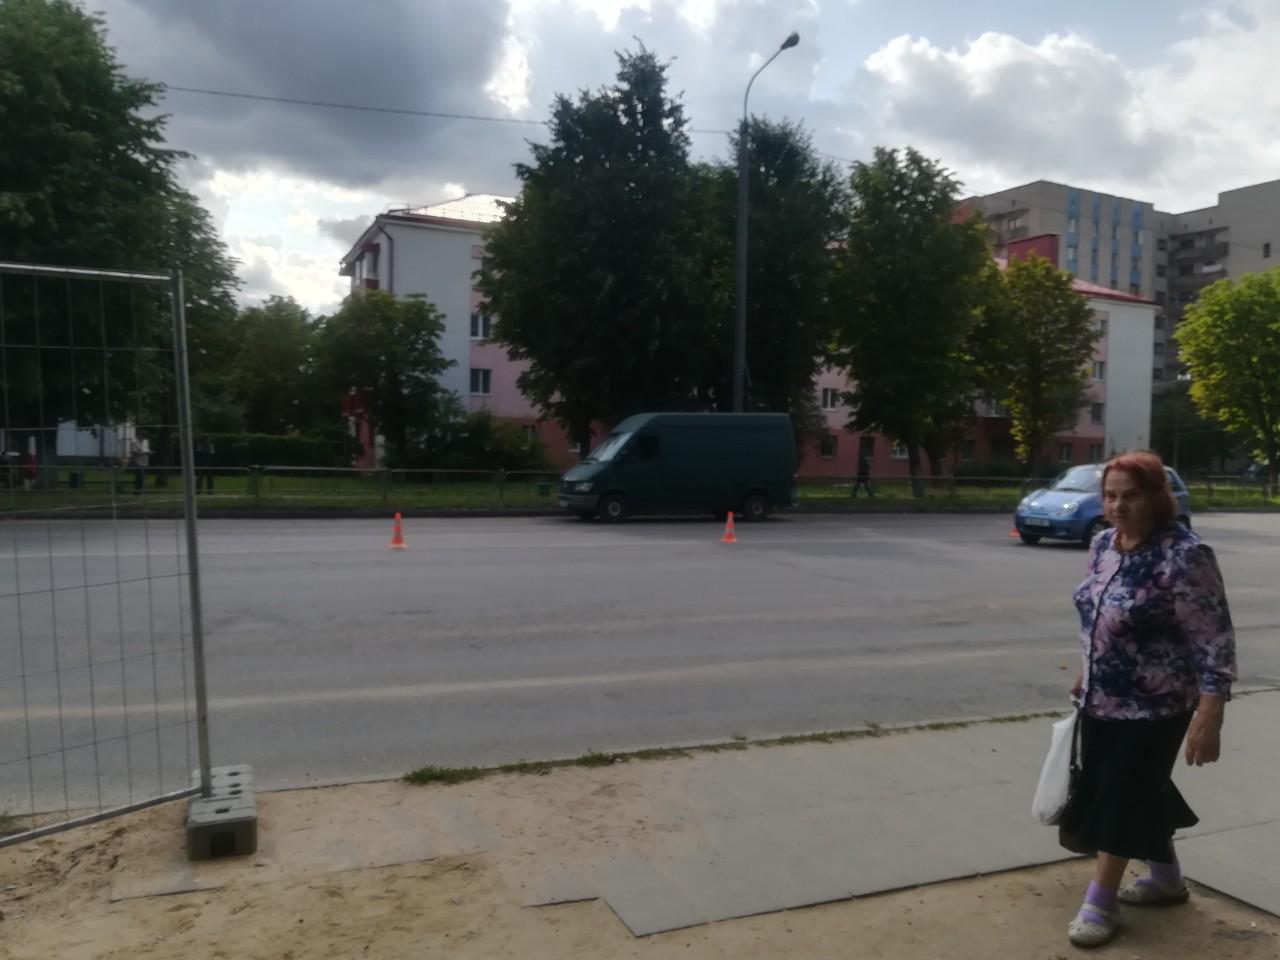 Микроавтобус, сбивший девочку. Фото: Ирина ПЛЮТО